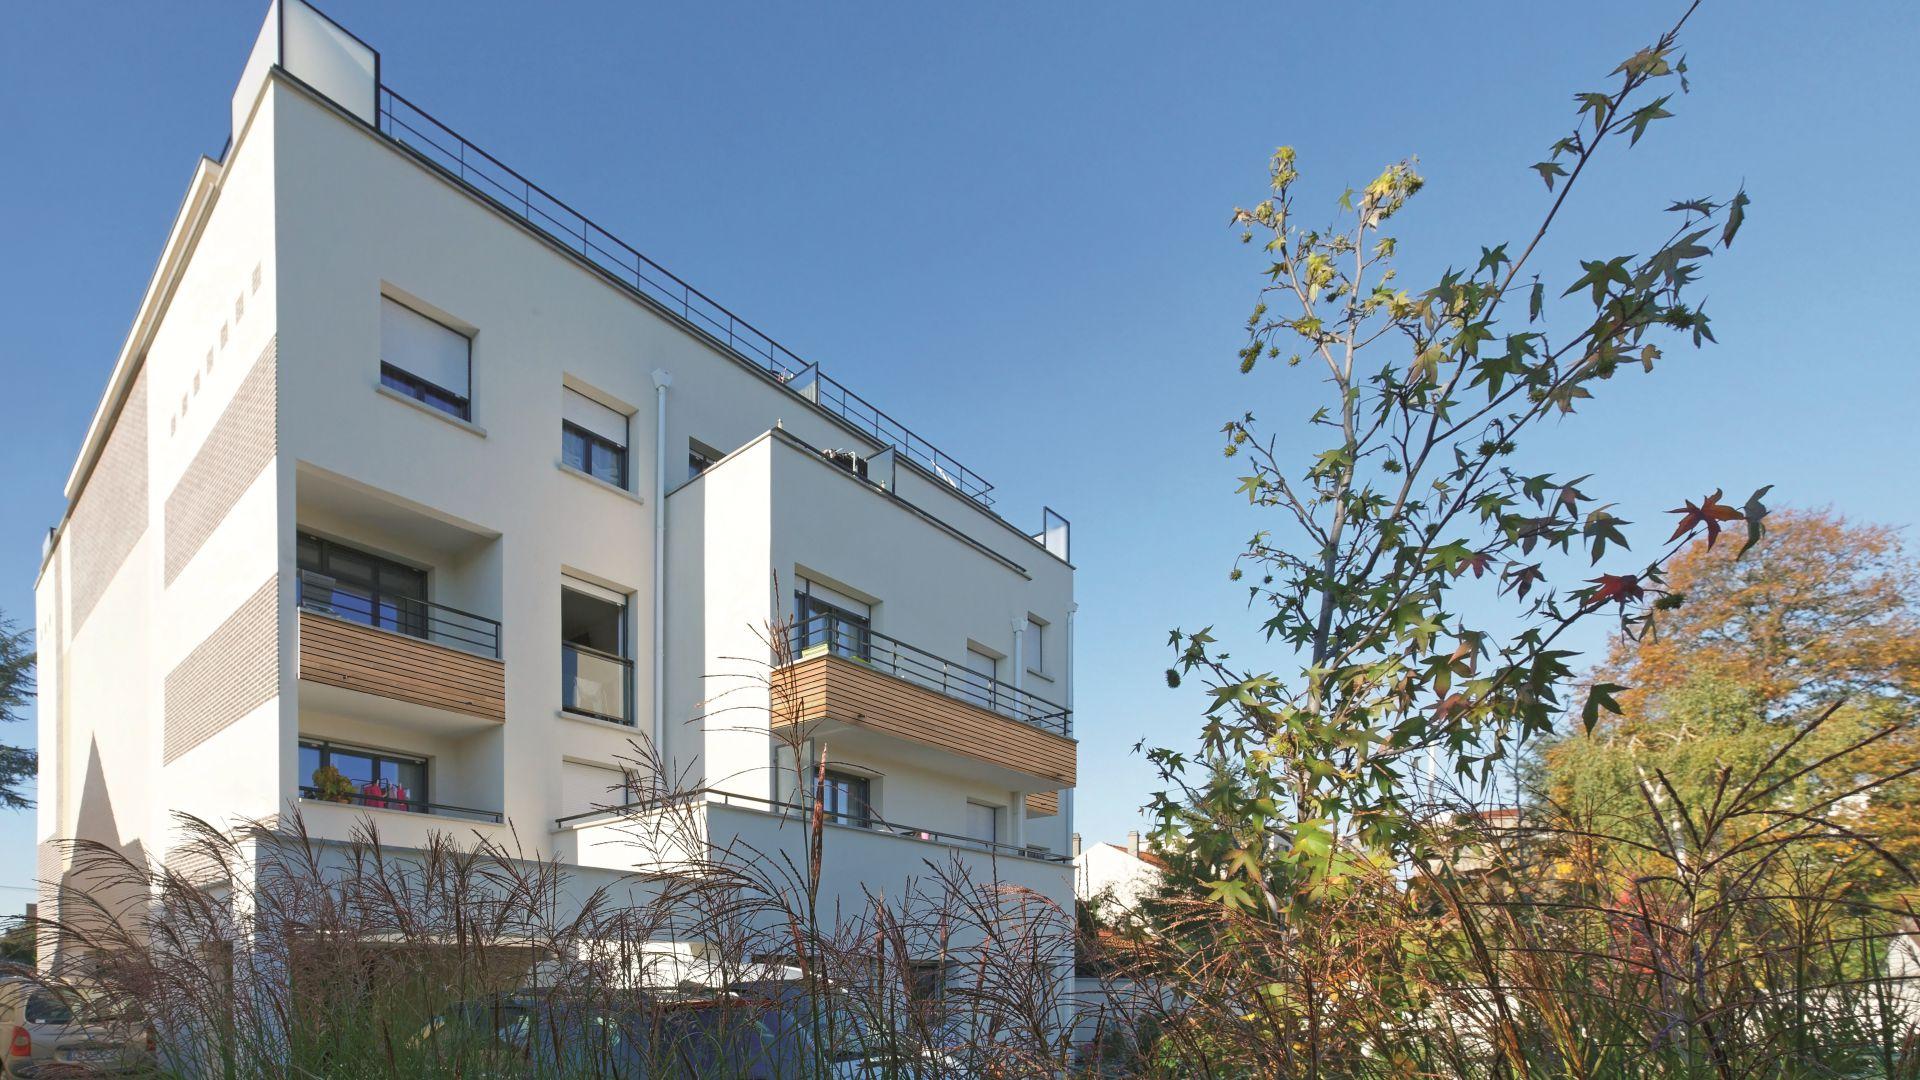 Greencity Immobilier - Résidence Villa Concorde - Le Blanc Mesnil - 93150